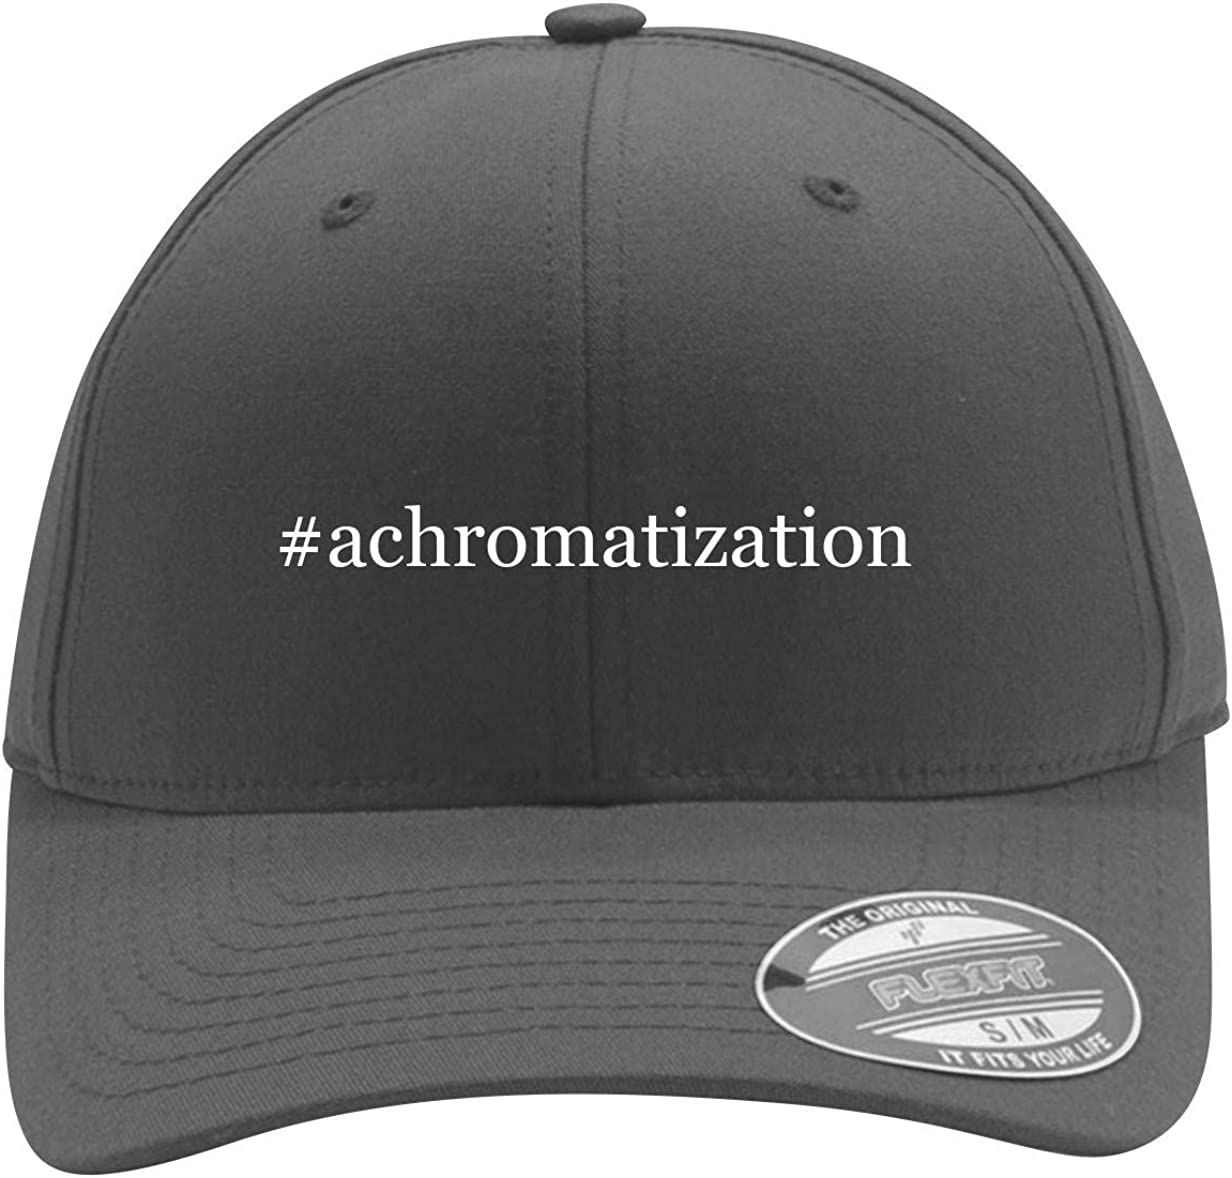 #Achromatization - Men'S Hashtag Flexfit Baseball Cap Hat